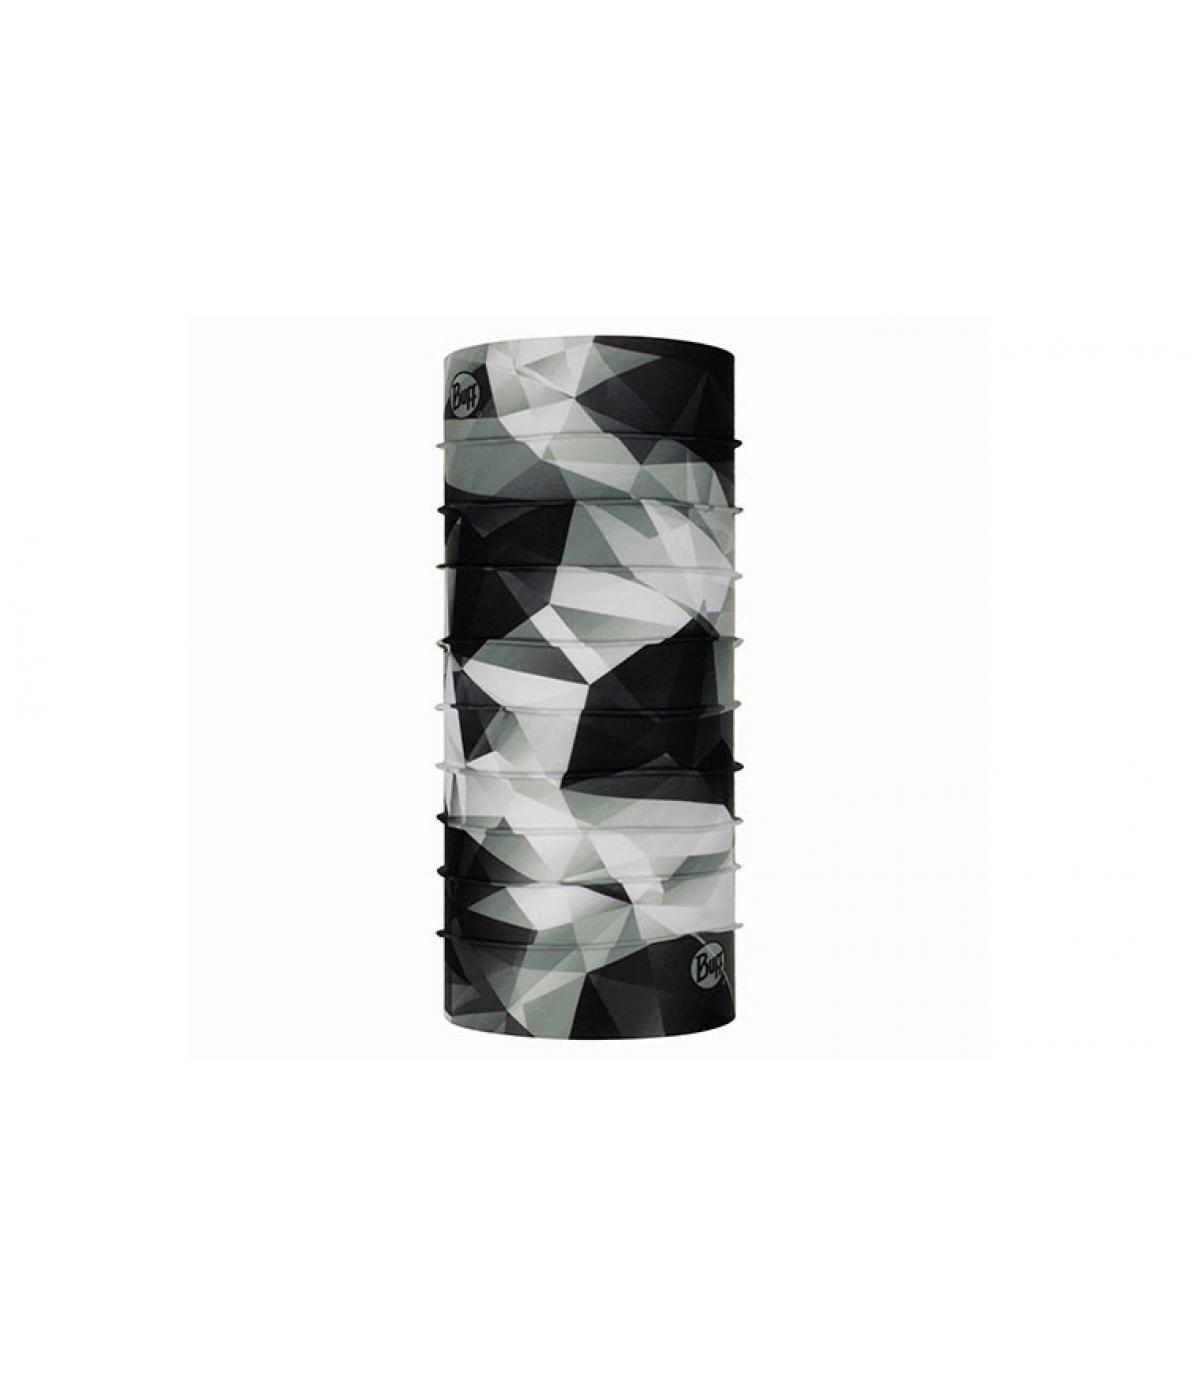 Buff zwart witte geometrische print